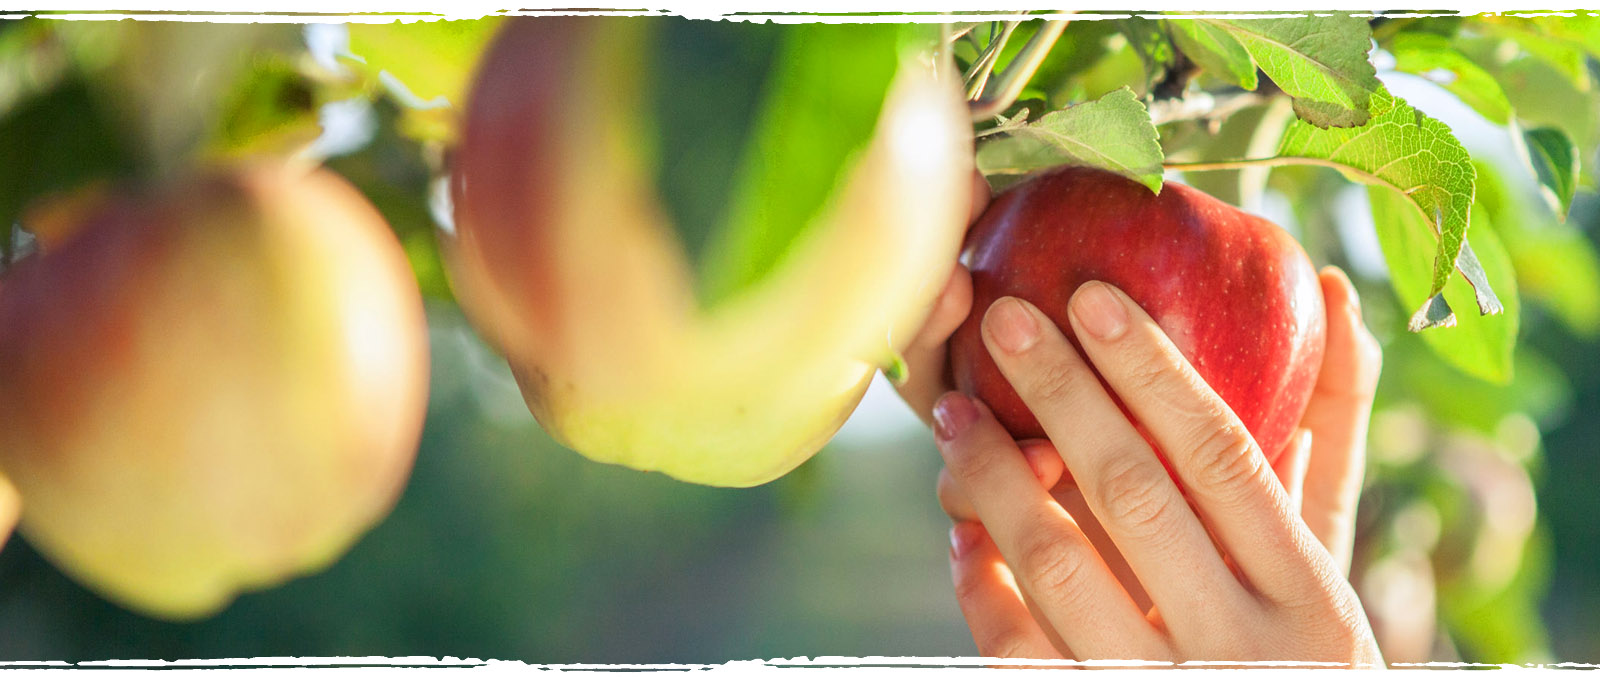 Apfel Selbst Pflücken